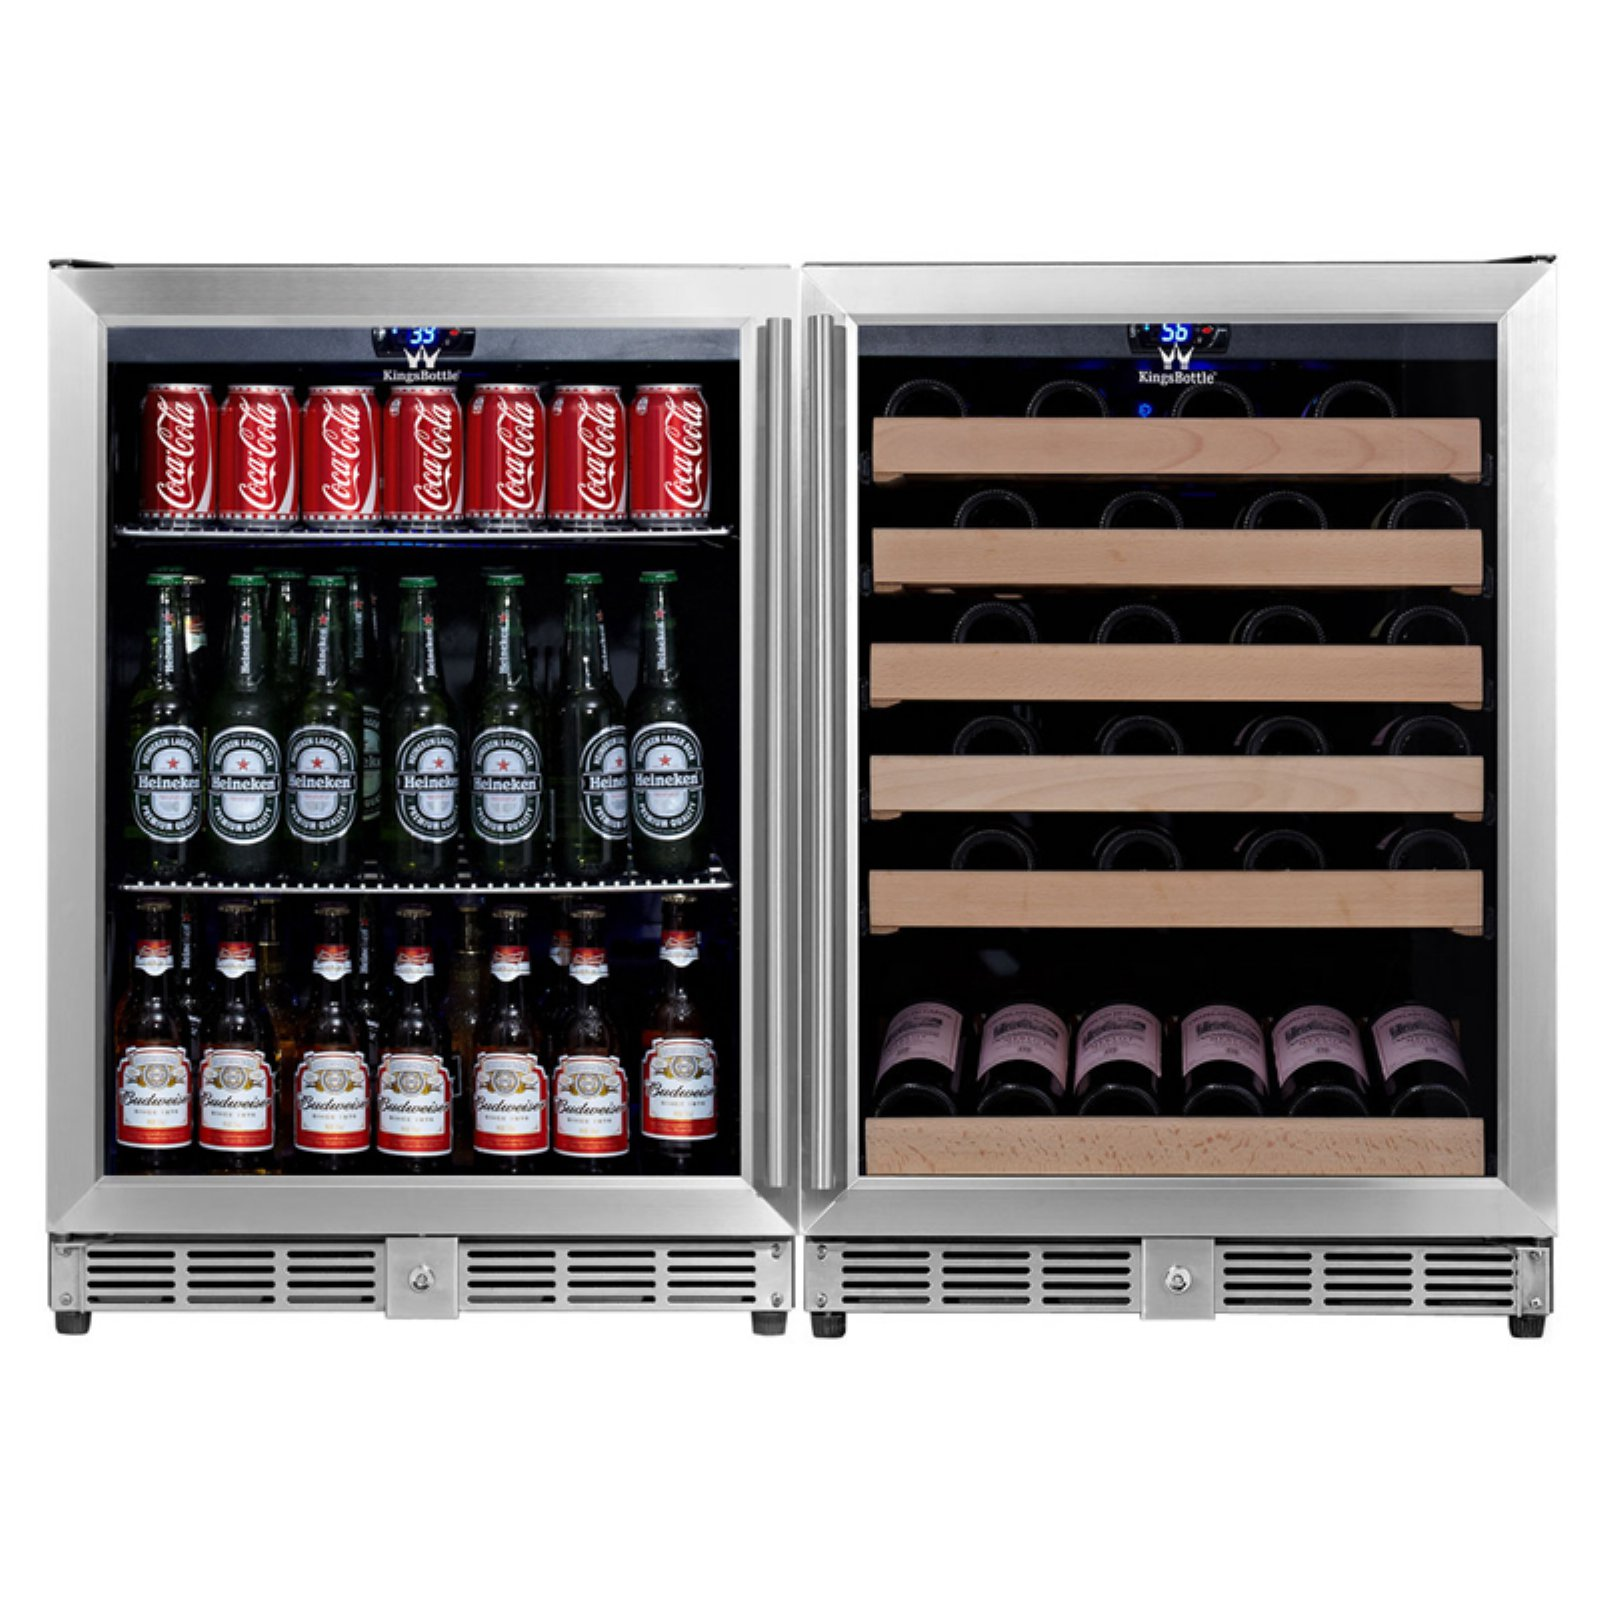 Kingsbottle 46-Wine 160-Beverage 2Temp Fridge